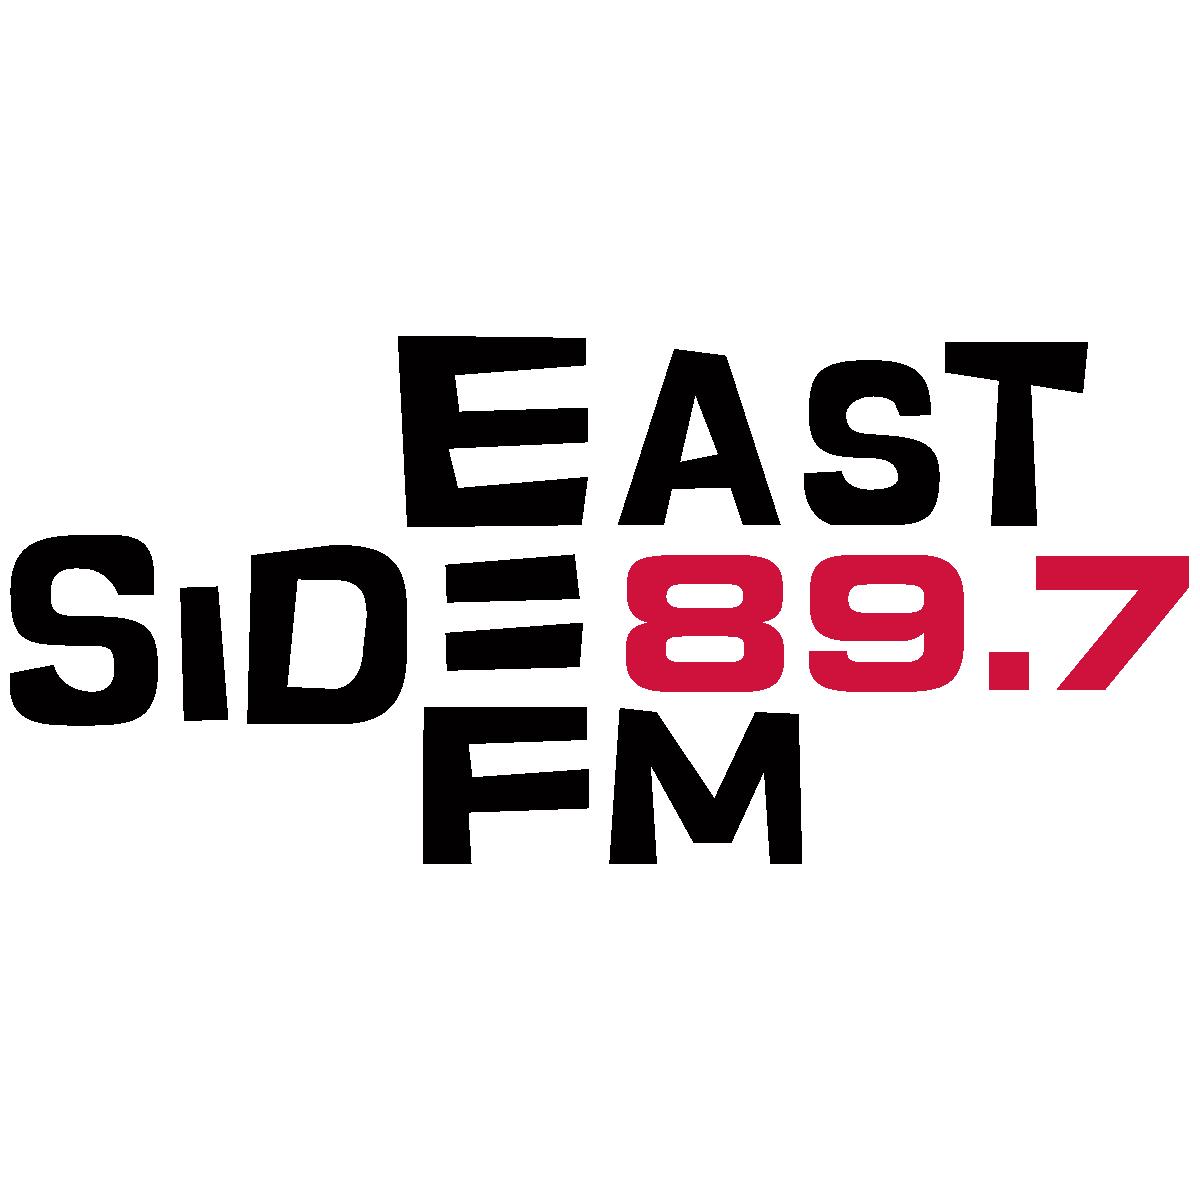 Musician/composer Adrian Cunningham